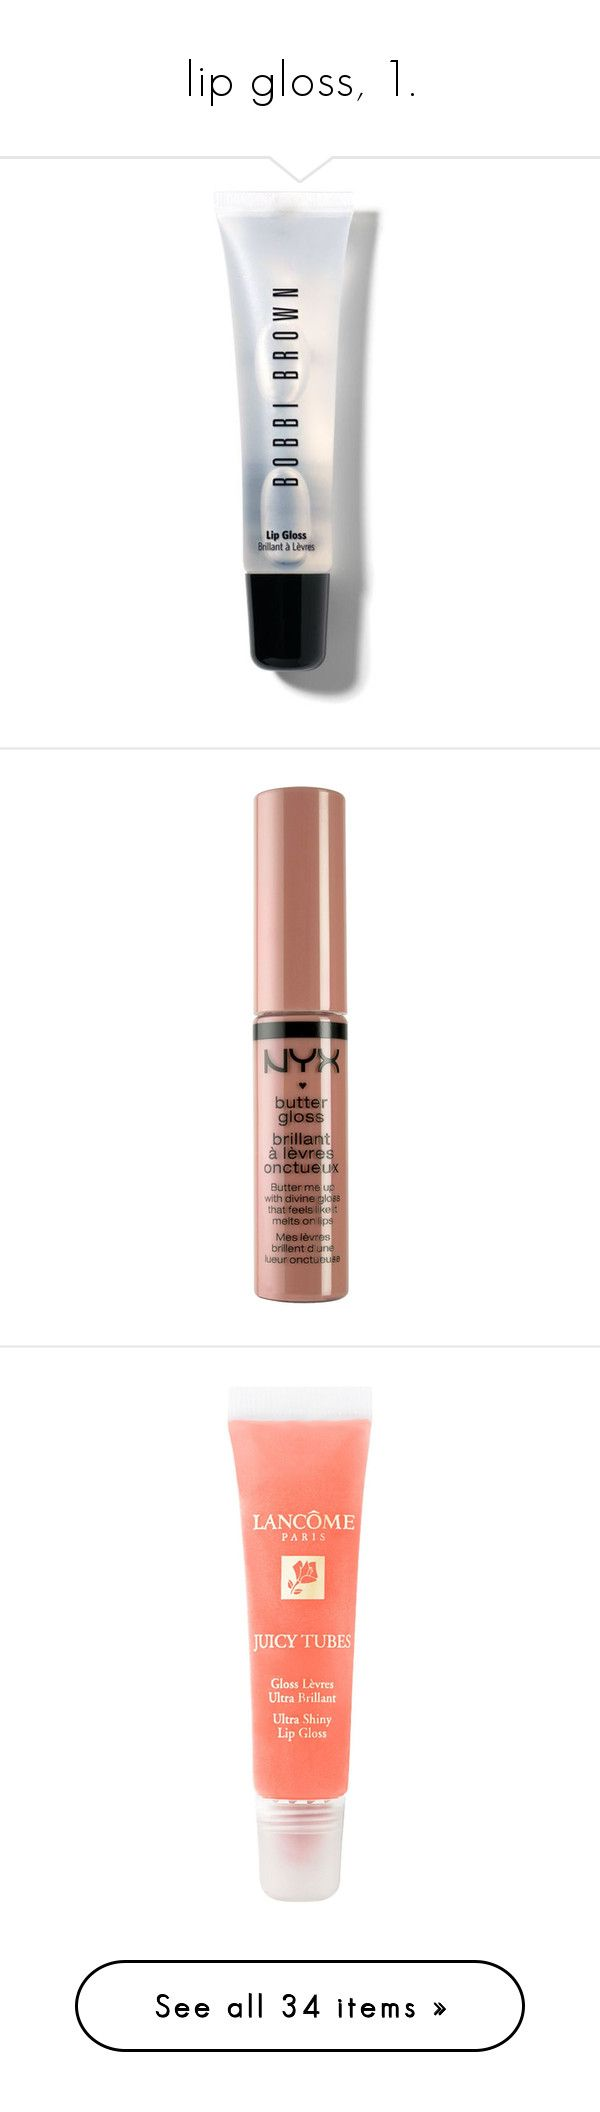 """lip gloss, 1."" by originalimanim ❤ liked on Polyvore featuring beauty products, makeup, lip makeup, lip gloss, beauty, lip, cosmetics, filler, lip shine and lip gloss makeup"